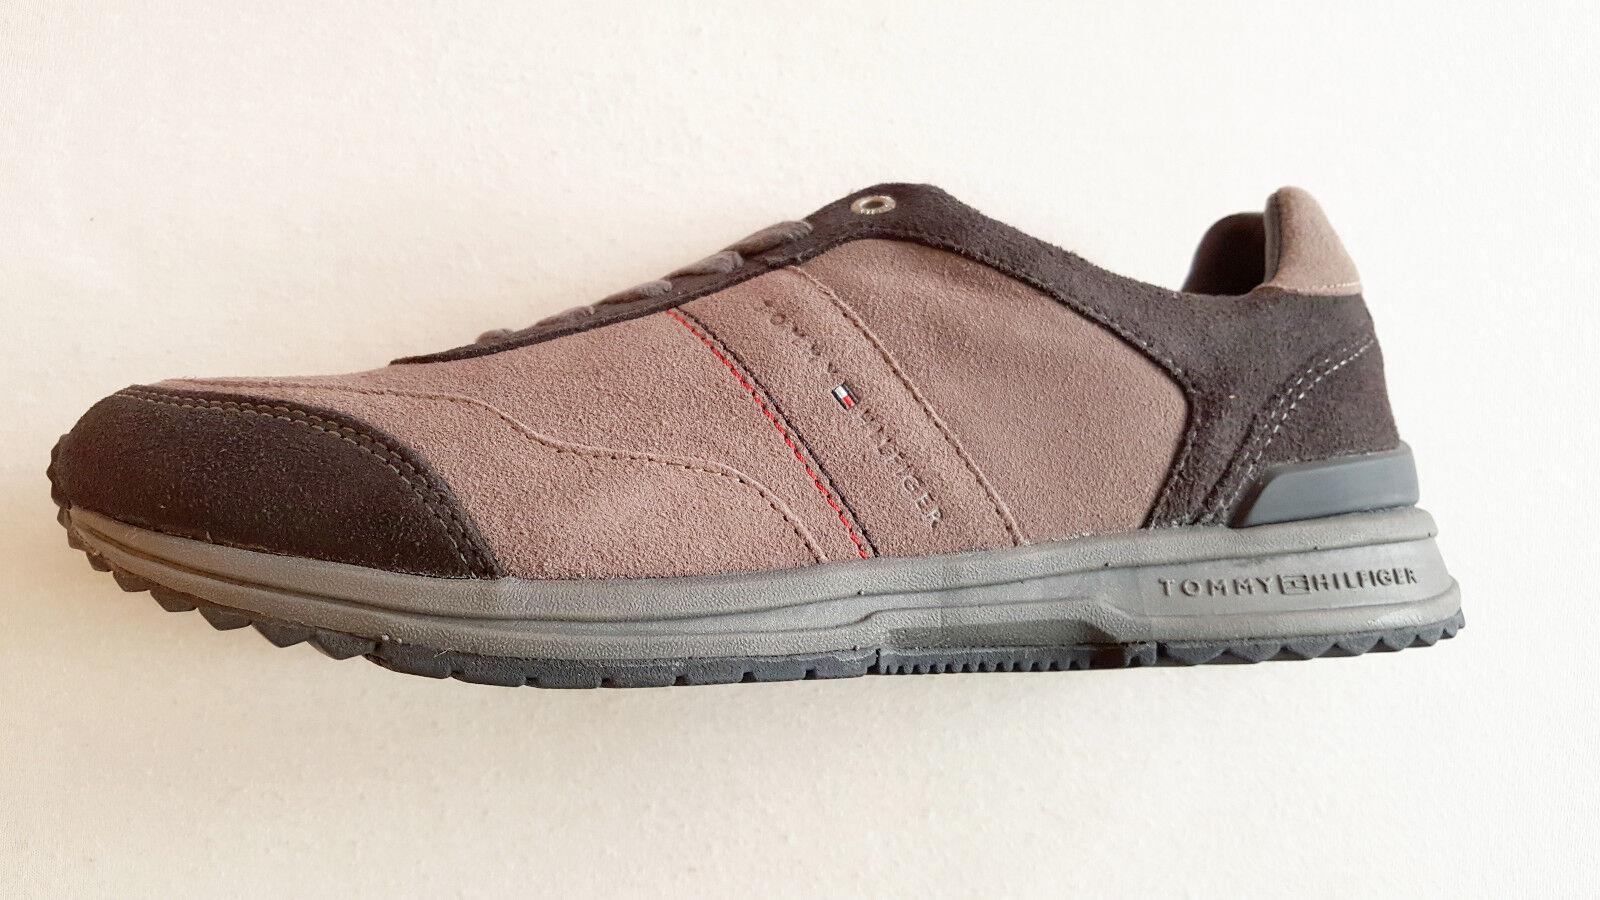 Tommy Hilfiger Sneaker, Farbe Grau, Gr.41, Neu